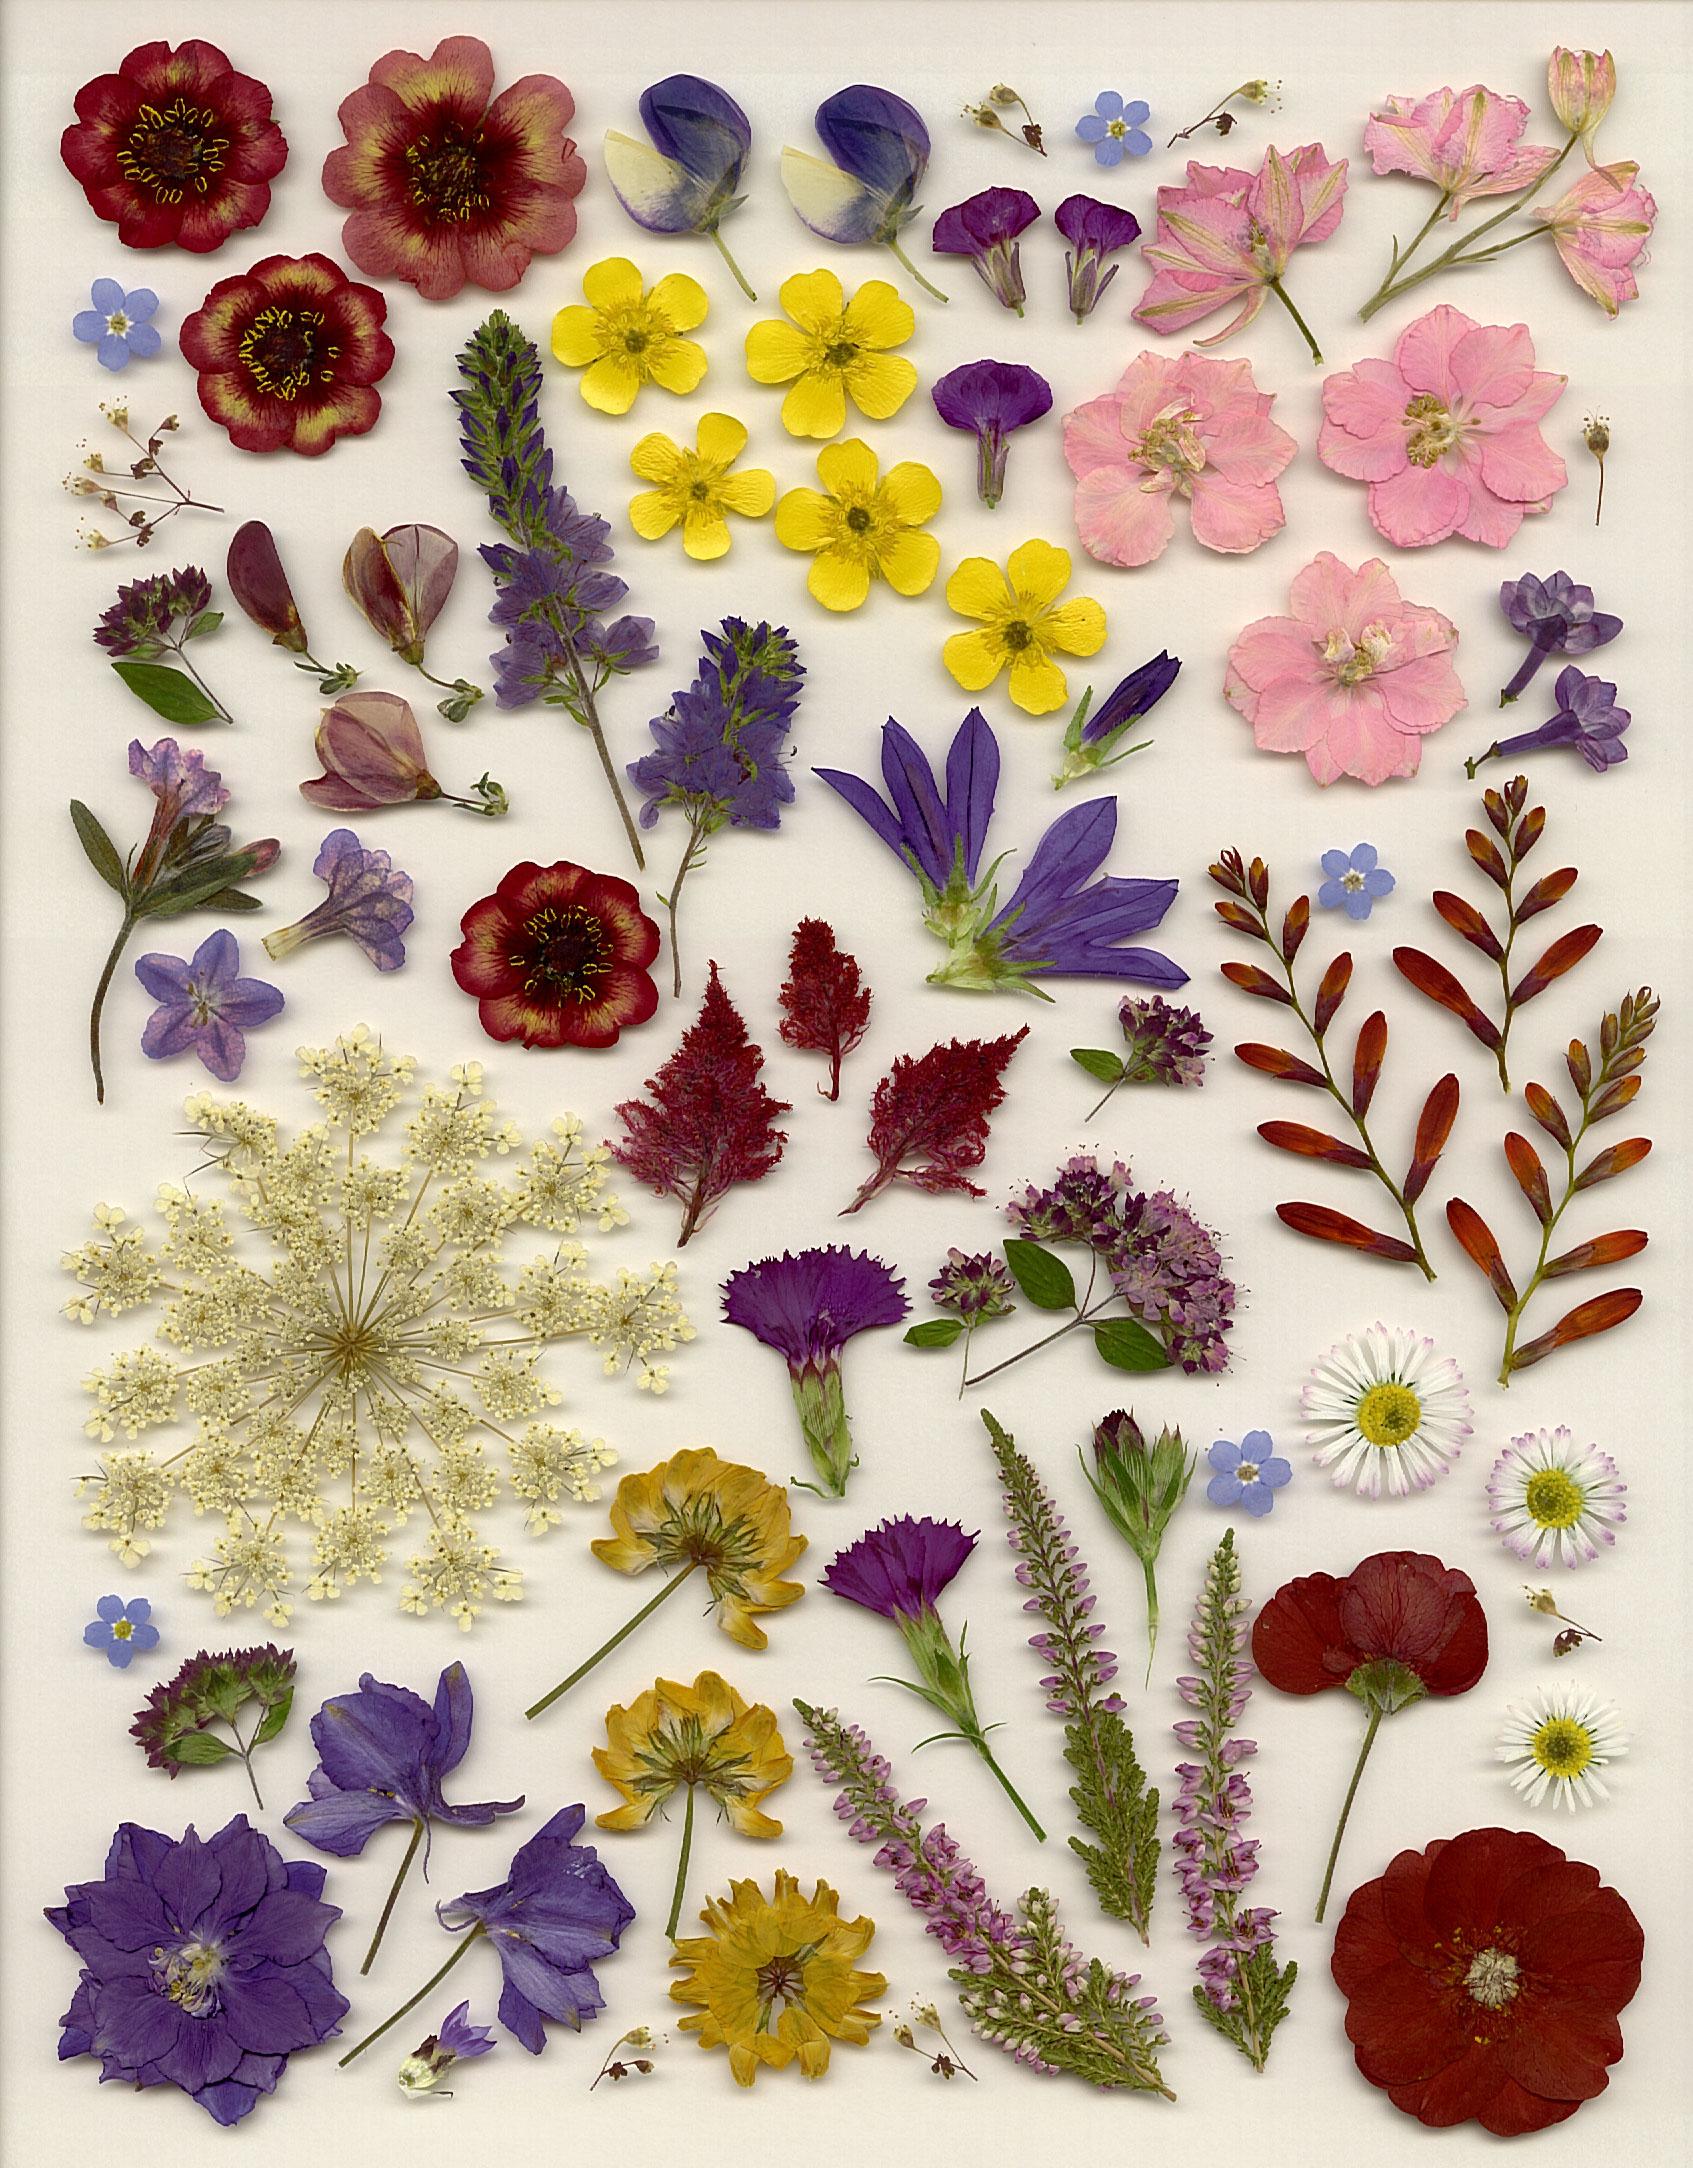 Em's Place Pressed Flower Categories